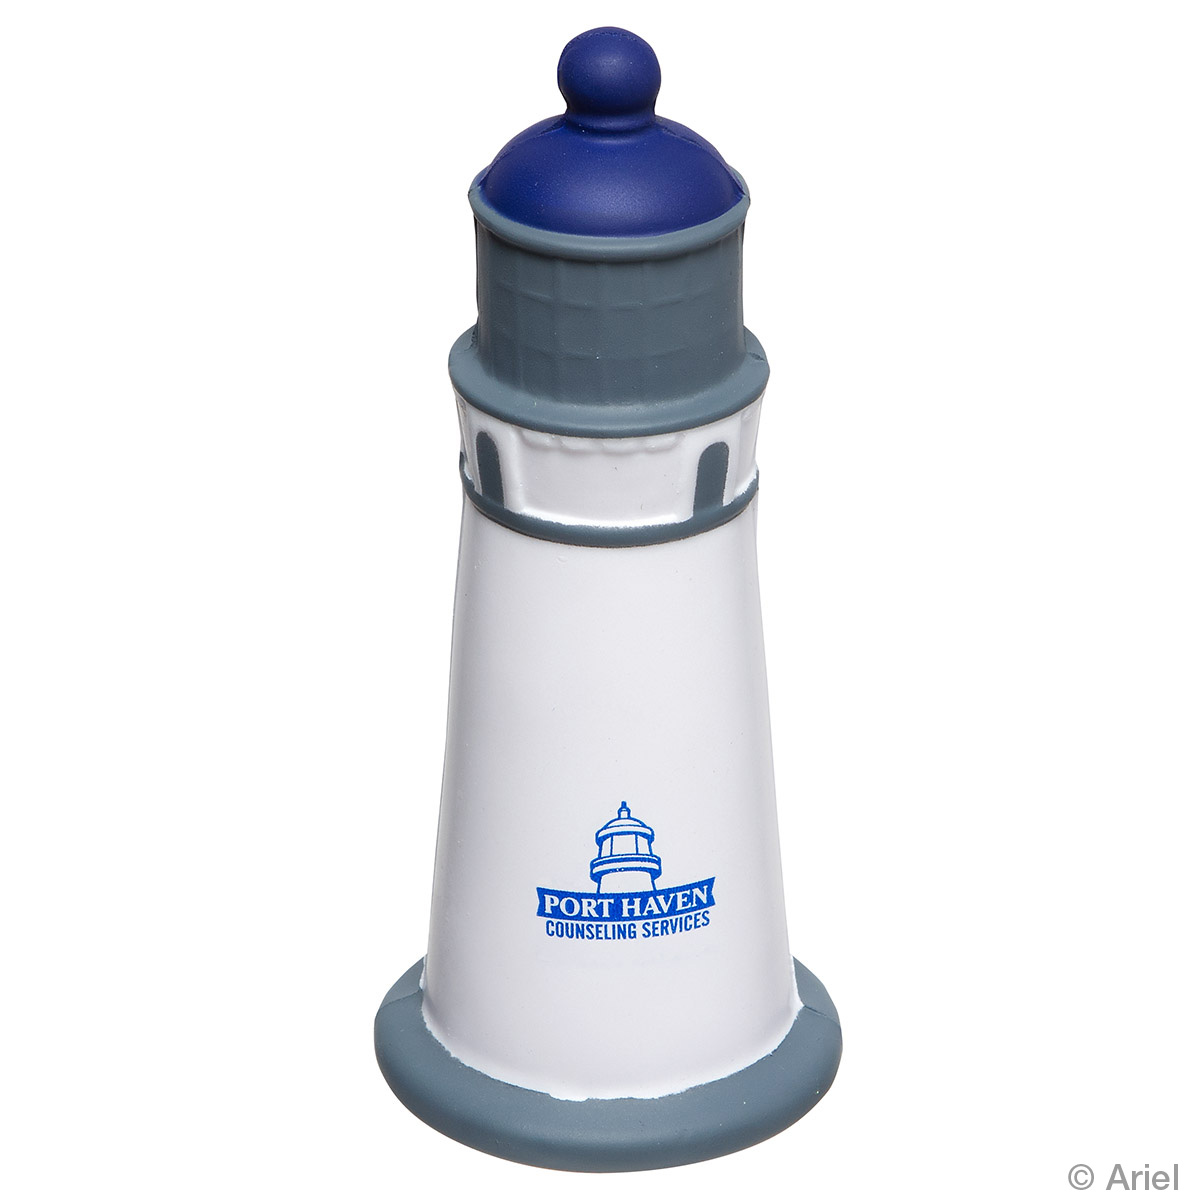 Lighthouse Stress Reliever, LTV-LH16 - 1 Colour Imprint